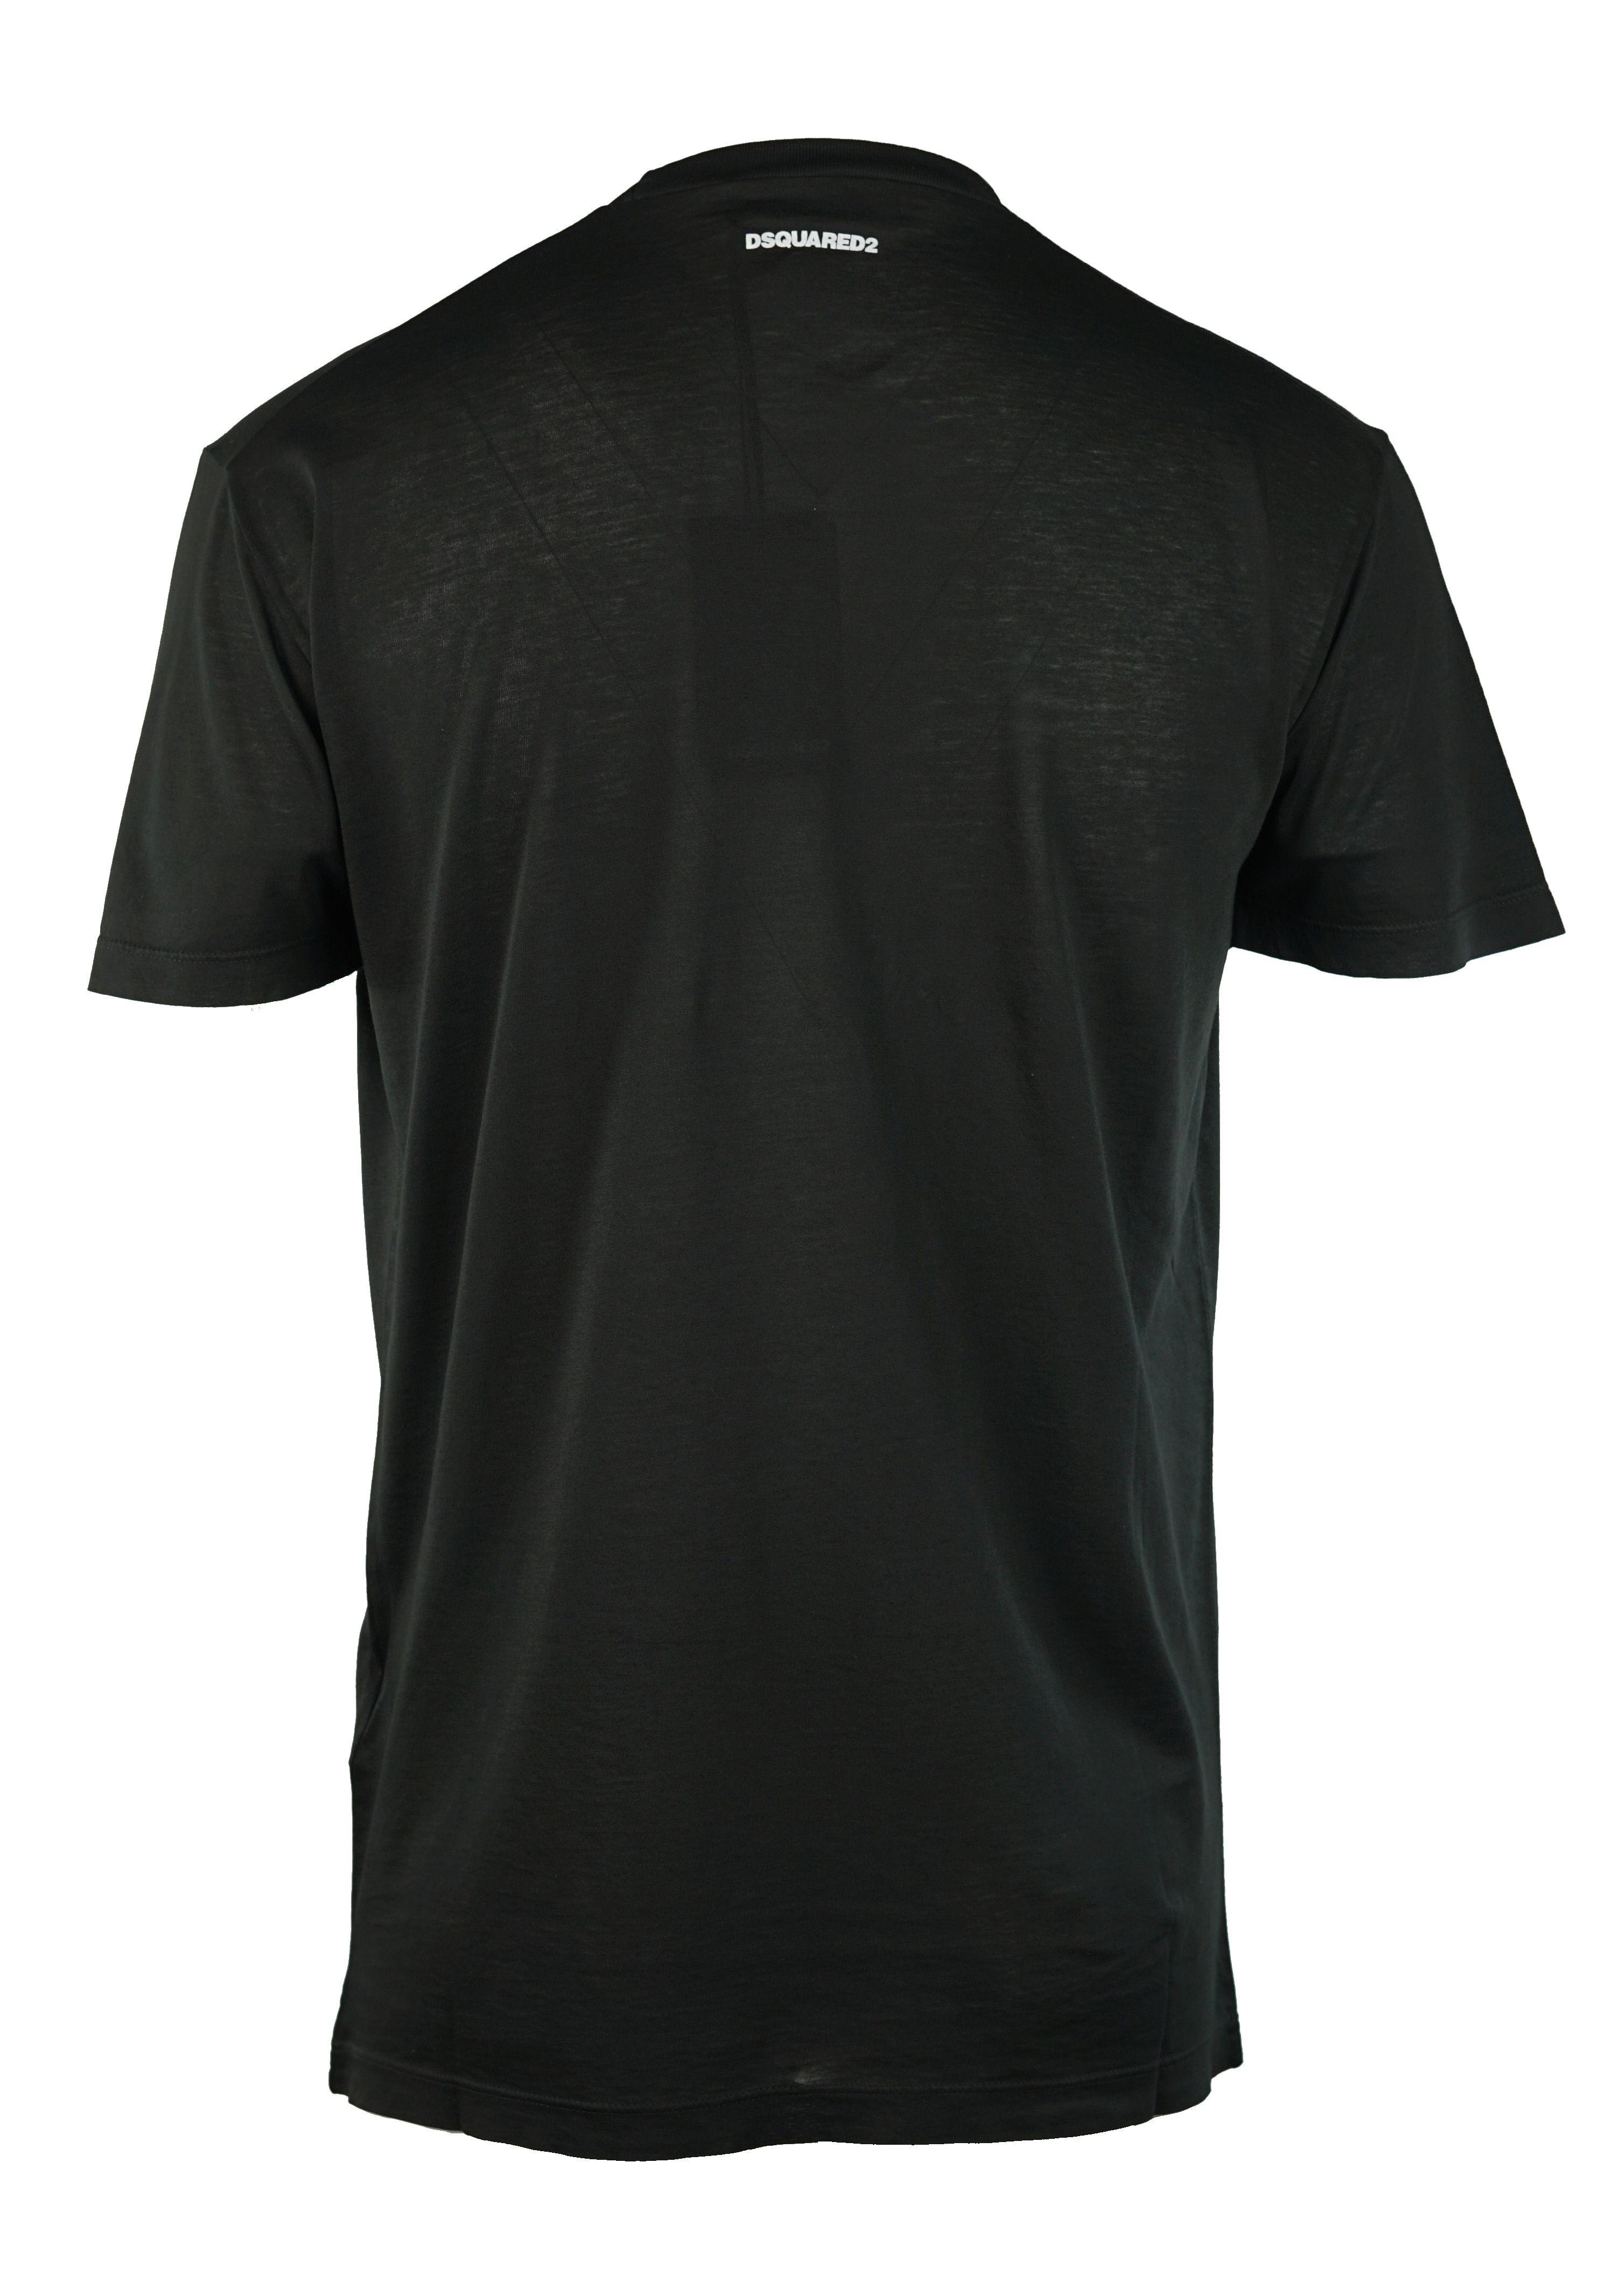 DSquared2 S71GD0683 S21600 900 T-Shirt